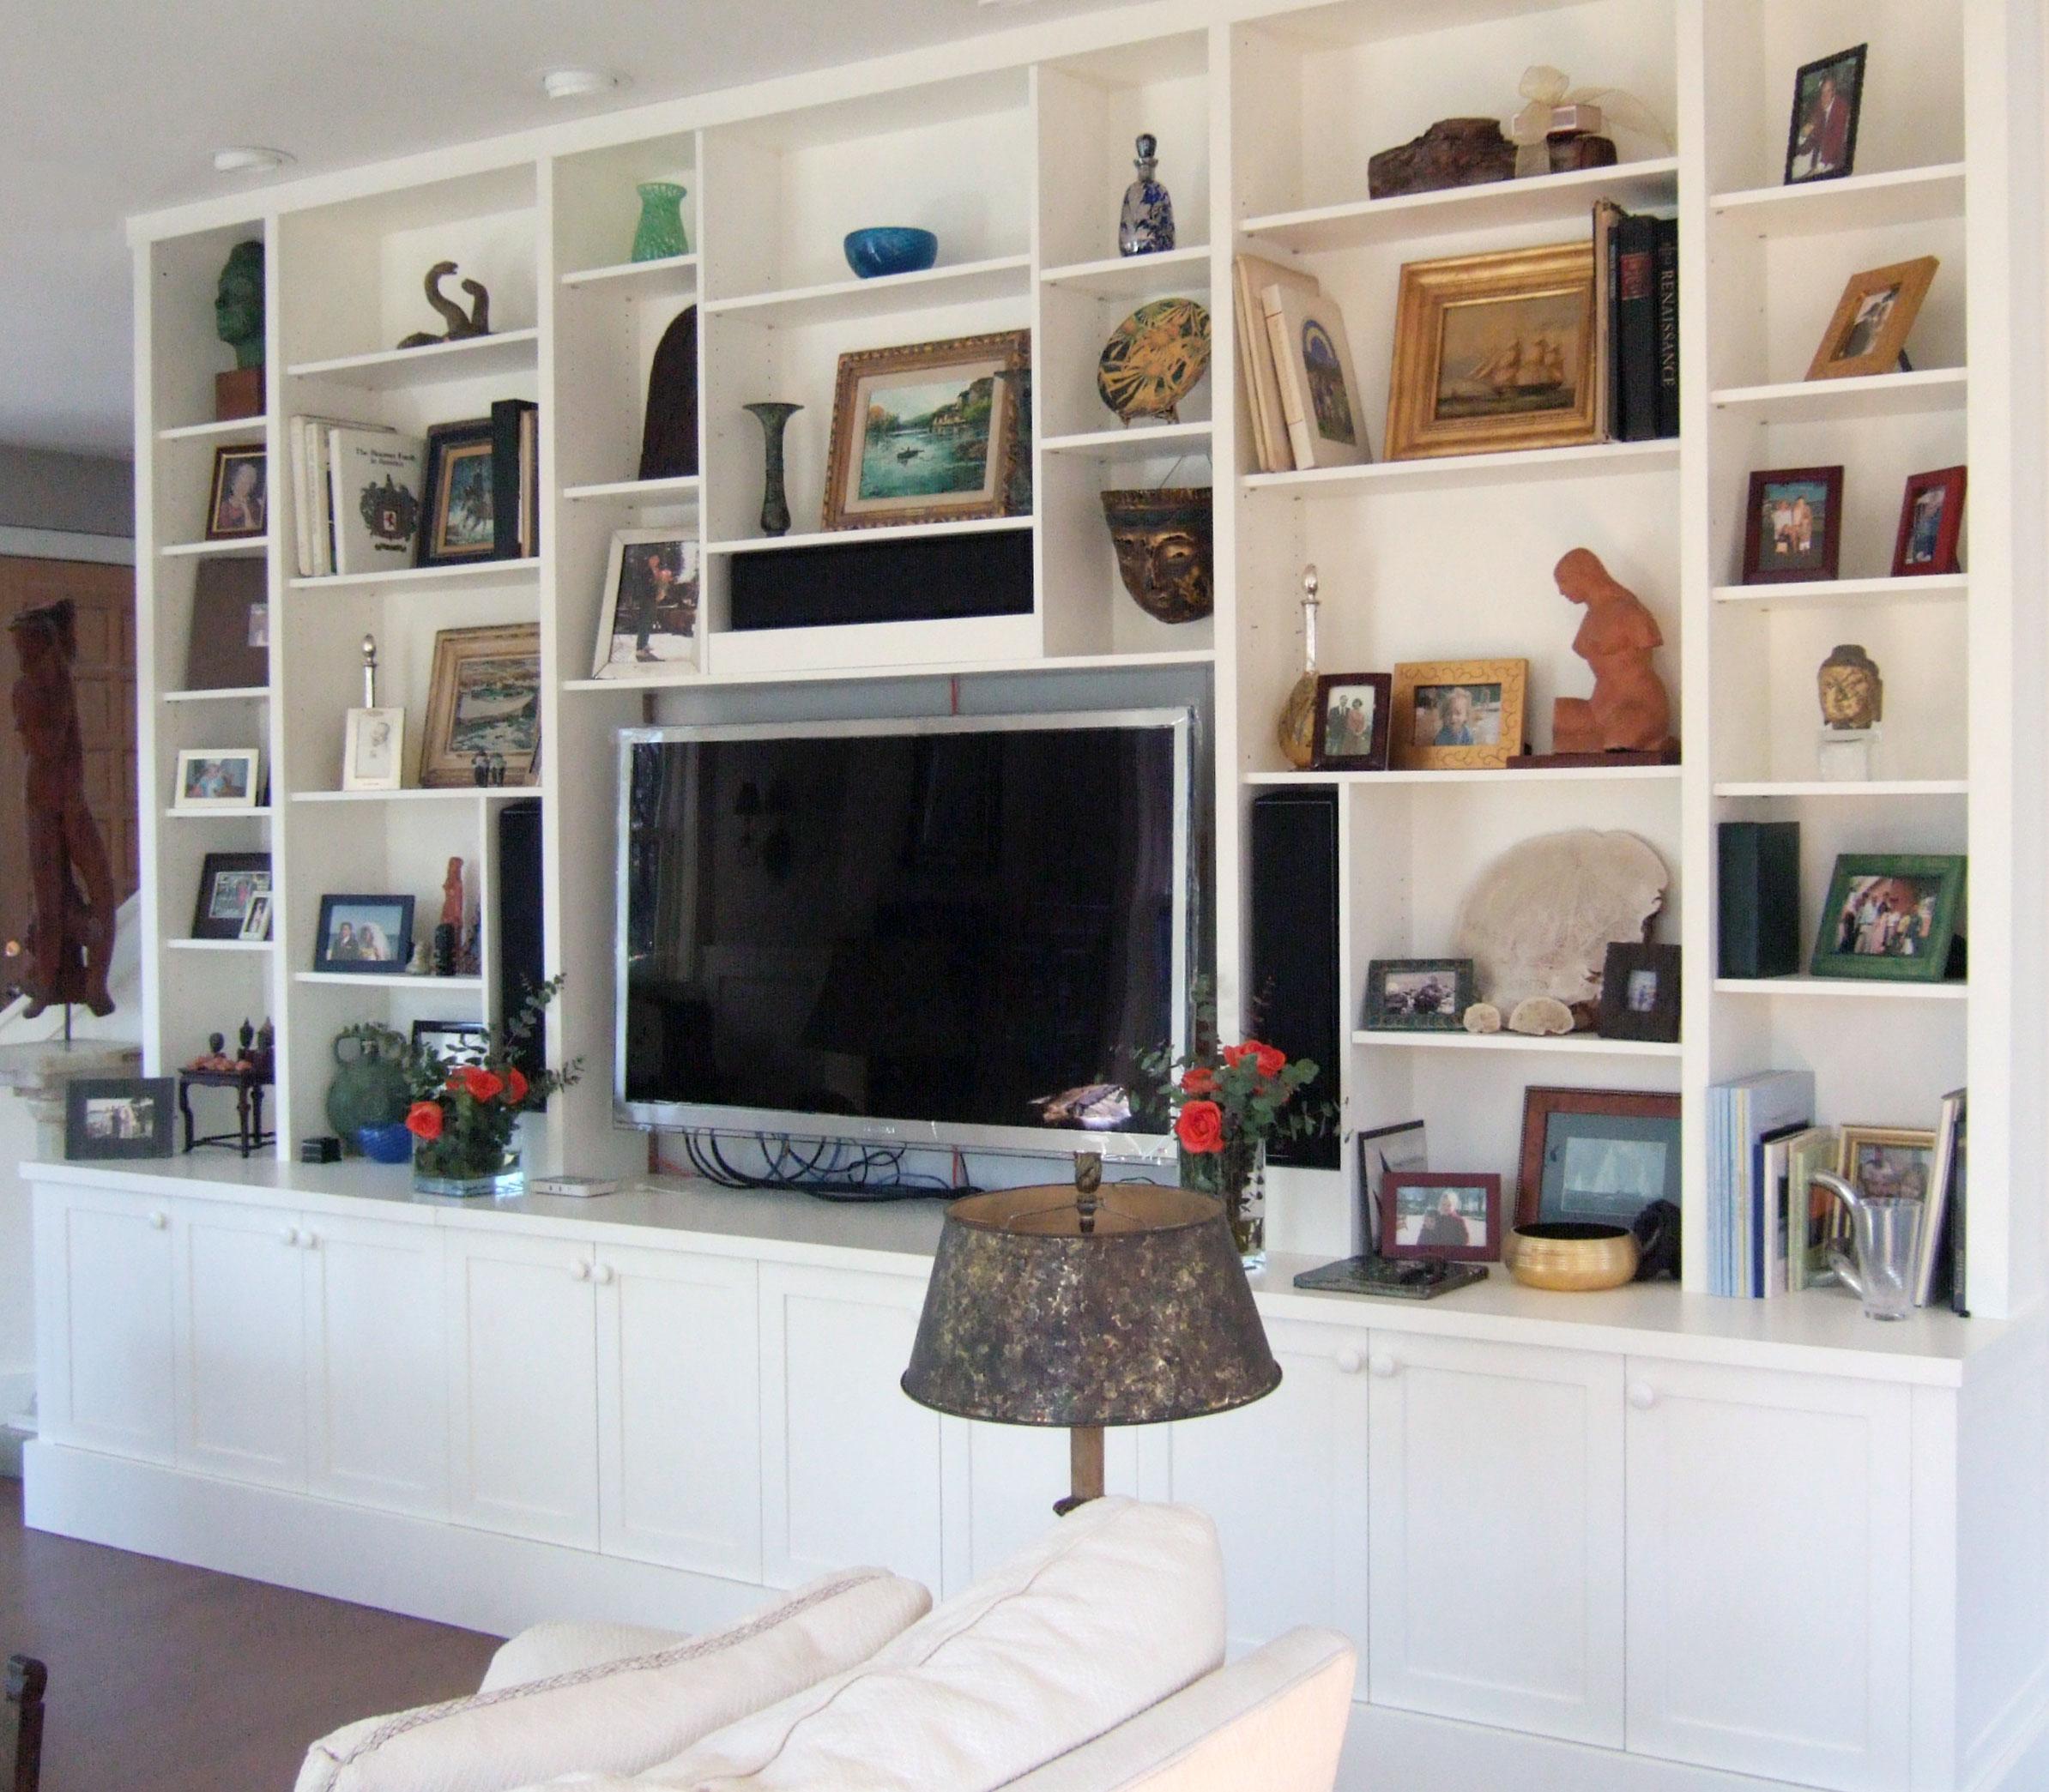 Rowayton-LEED-Gold-Living-Room-Built-ins.jpg